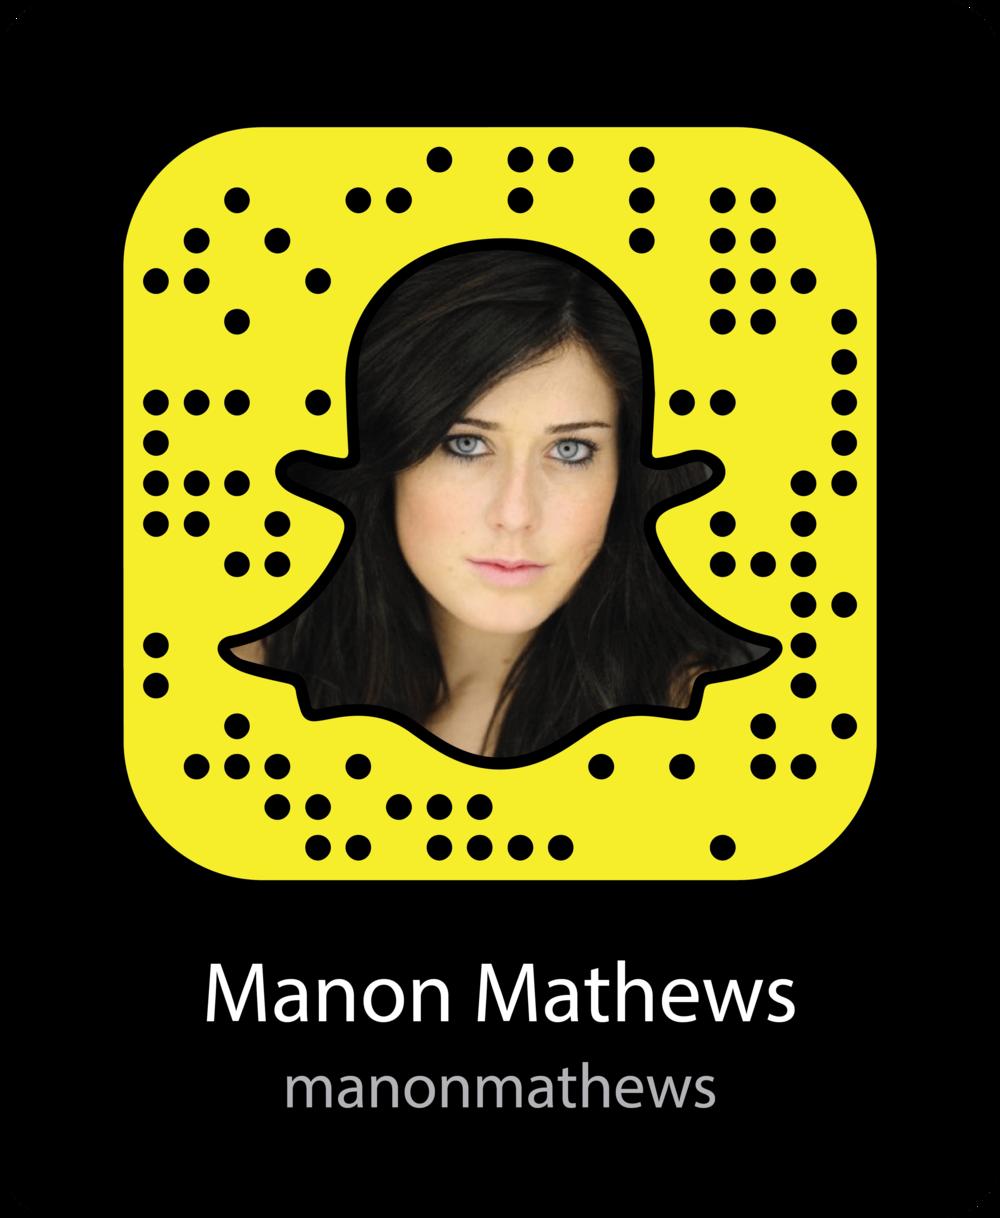 mannon-mathews-vine-celebrity-snapchat-snapcode